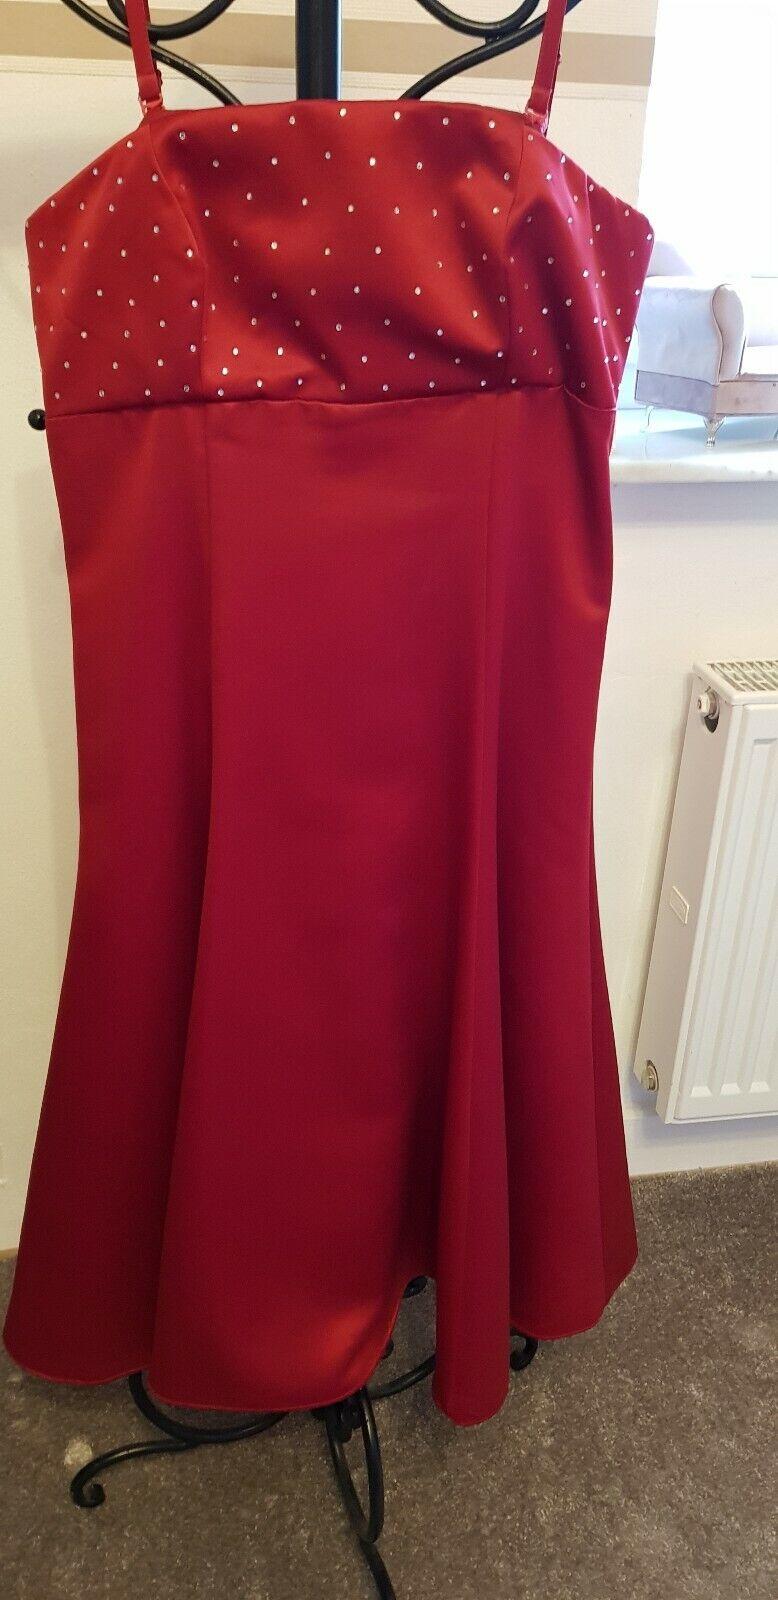 Abendkleid Ballkleid Kleid Peek & Cloppenburg Mariposa Corsage Gr. 38 neuwertig